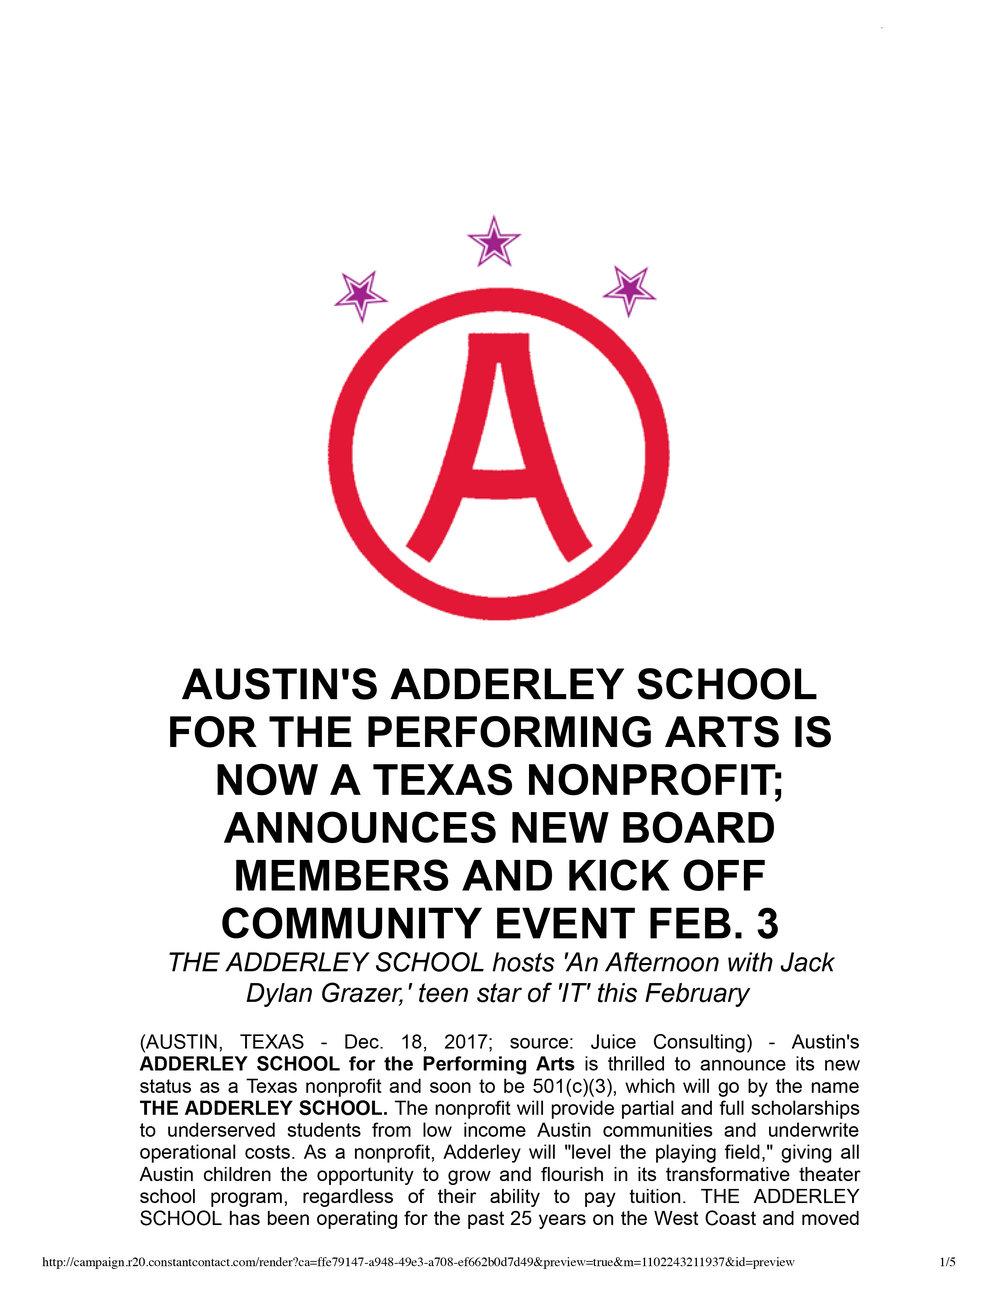 THE ADDERLEY SCHOOL for the Performing ...h Jack Dylan Grazer, teen star of 'IT'-1.jpg